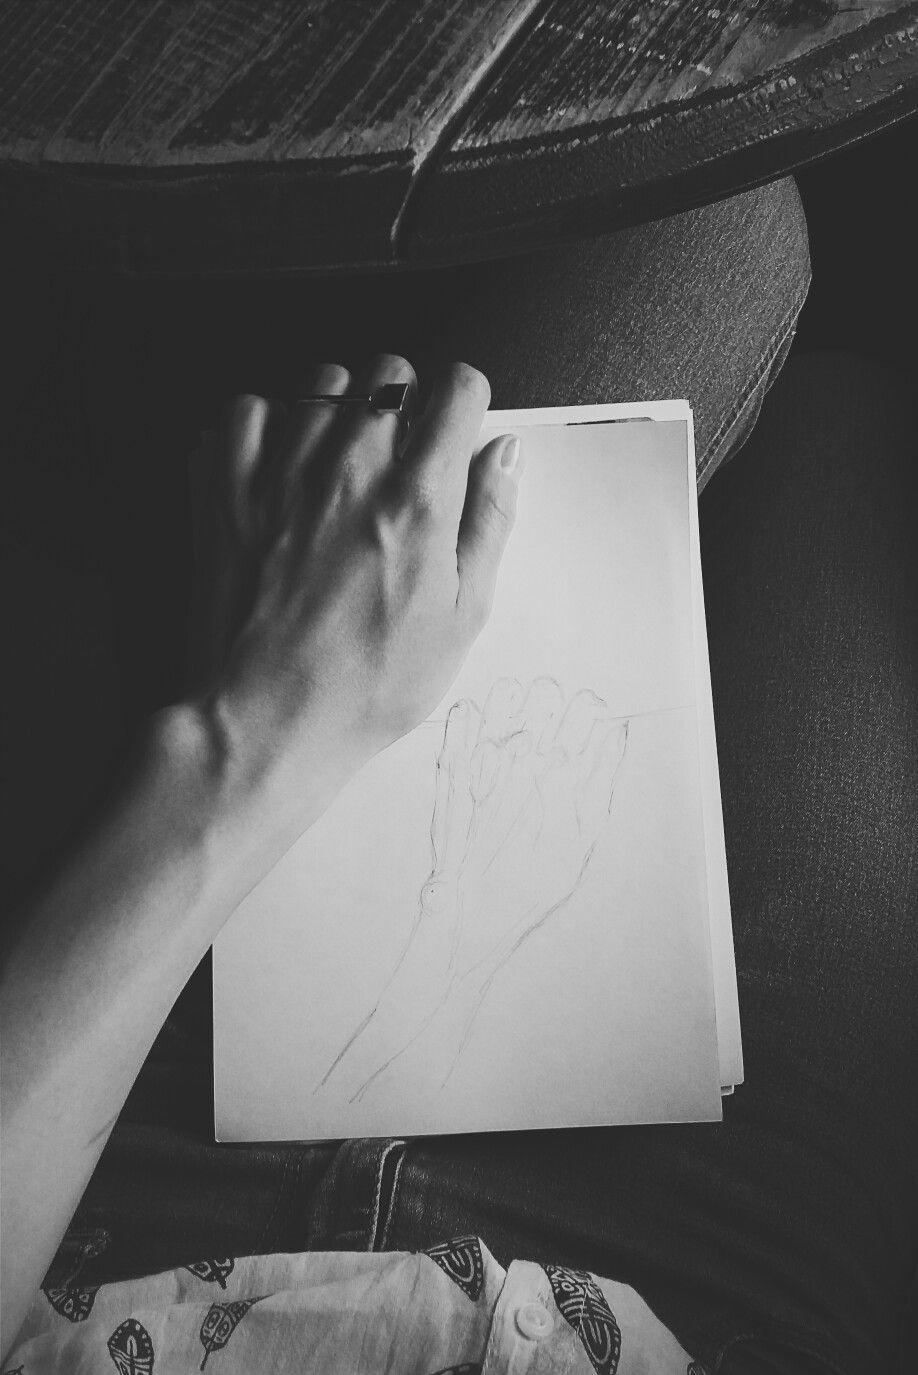 #art #hand #monochrome #inspiration